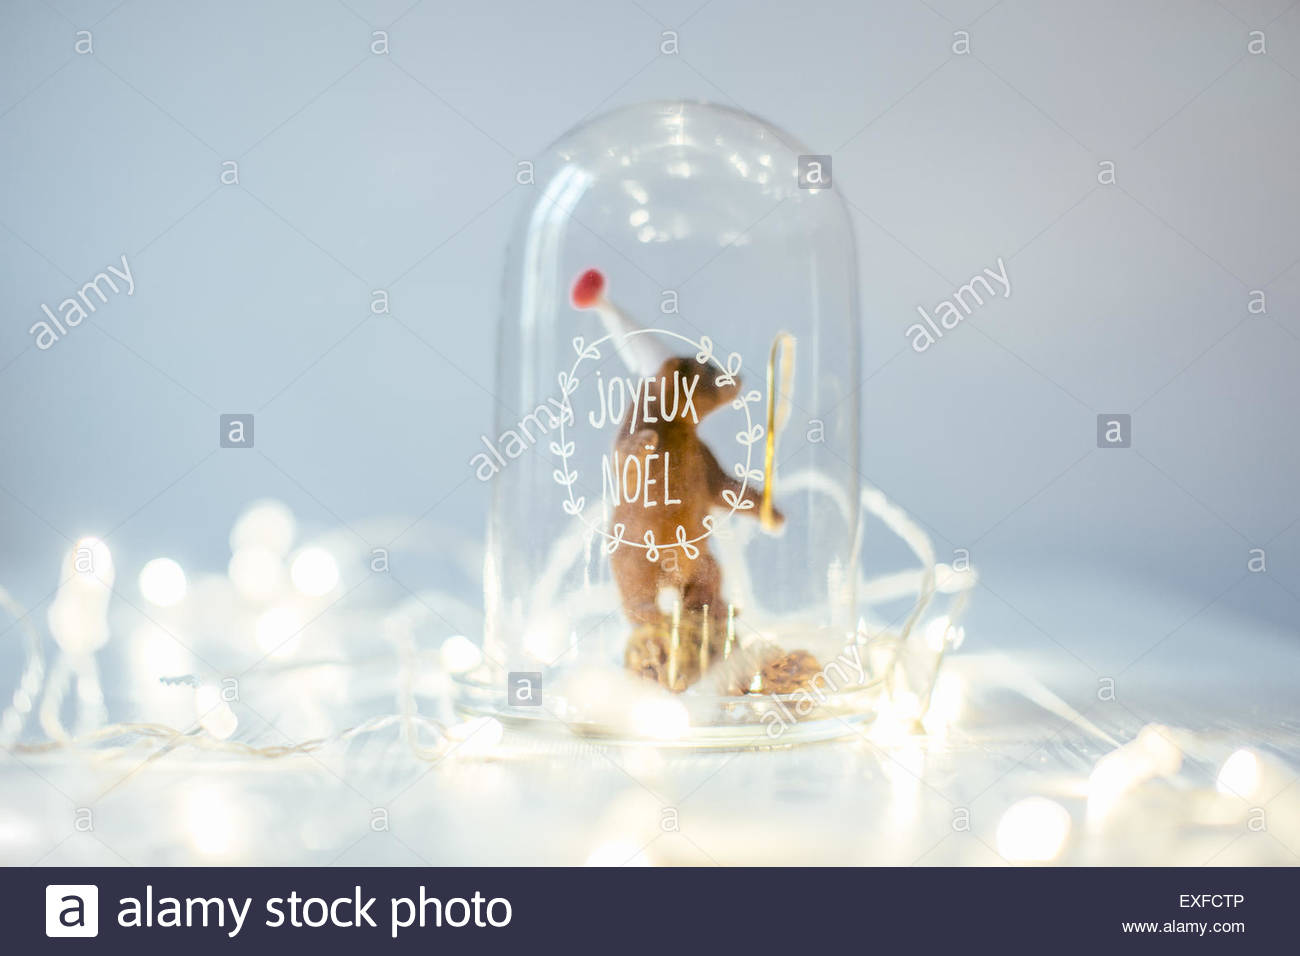 Christmas decoration and lights - Stock Image